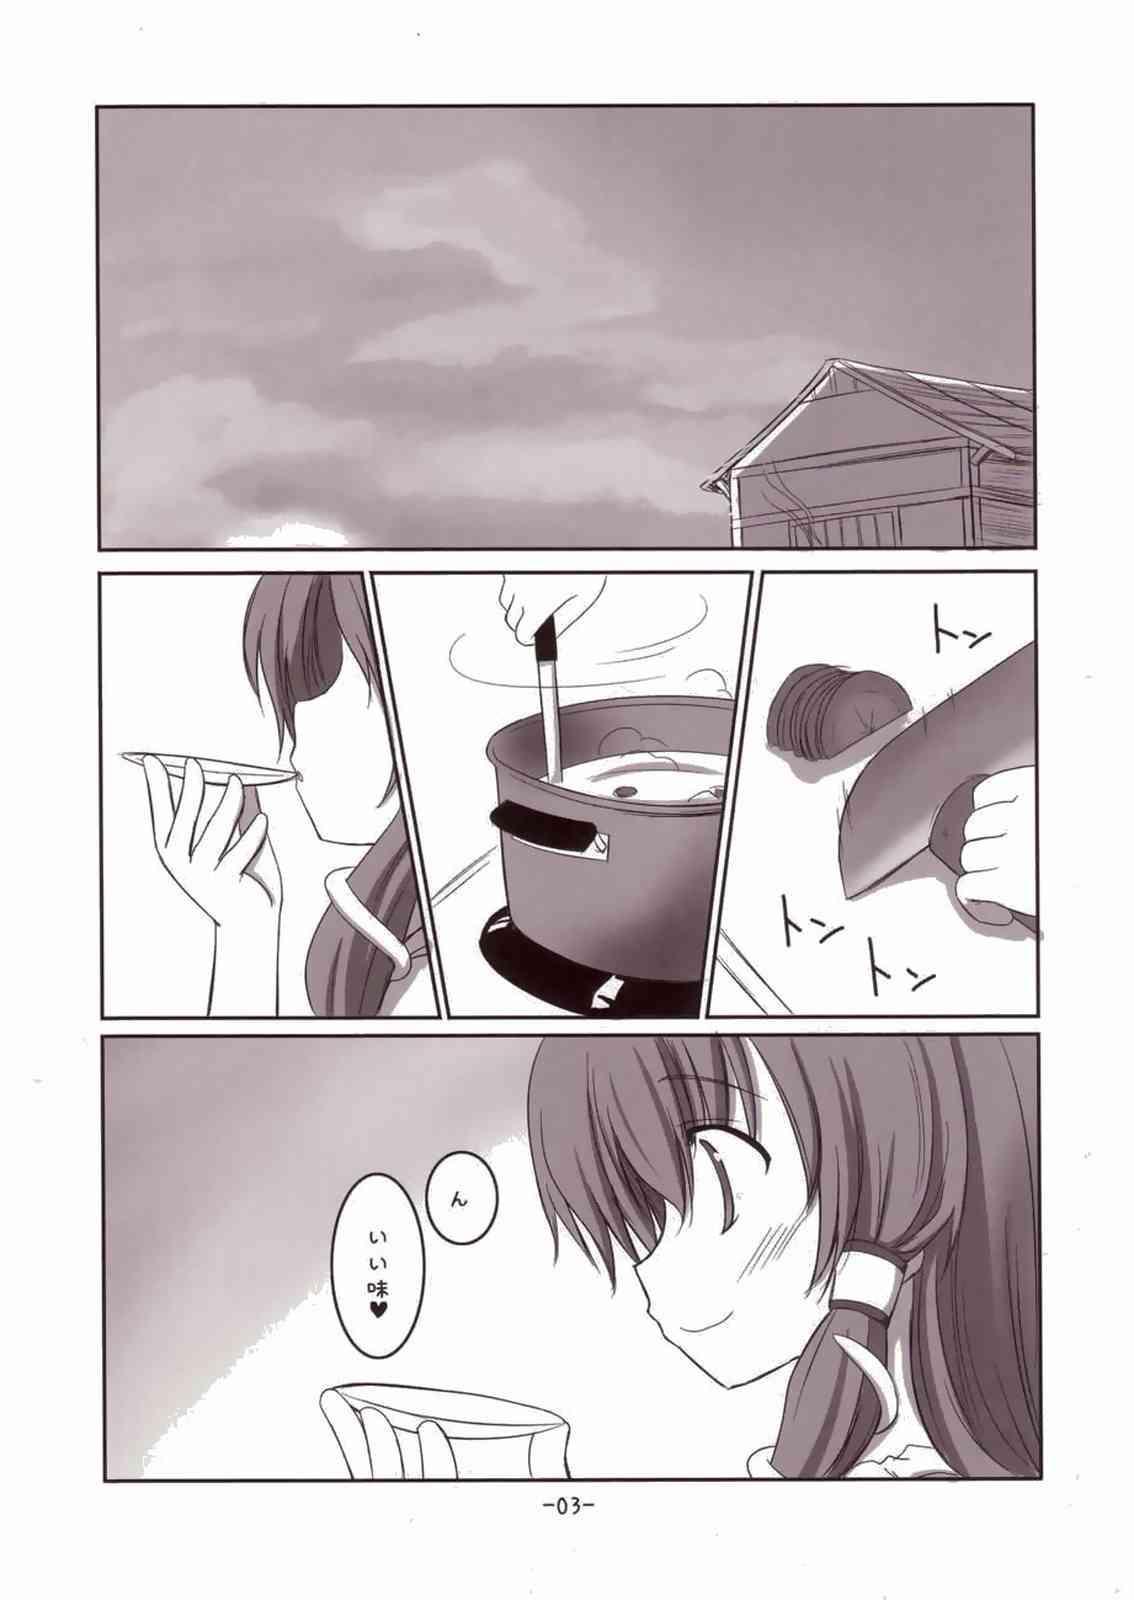 Suwako-sama to Issho! 2